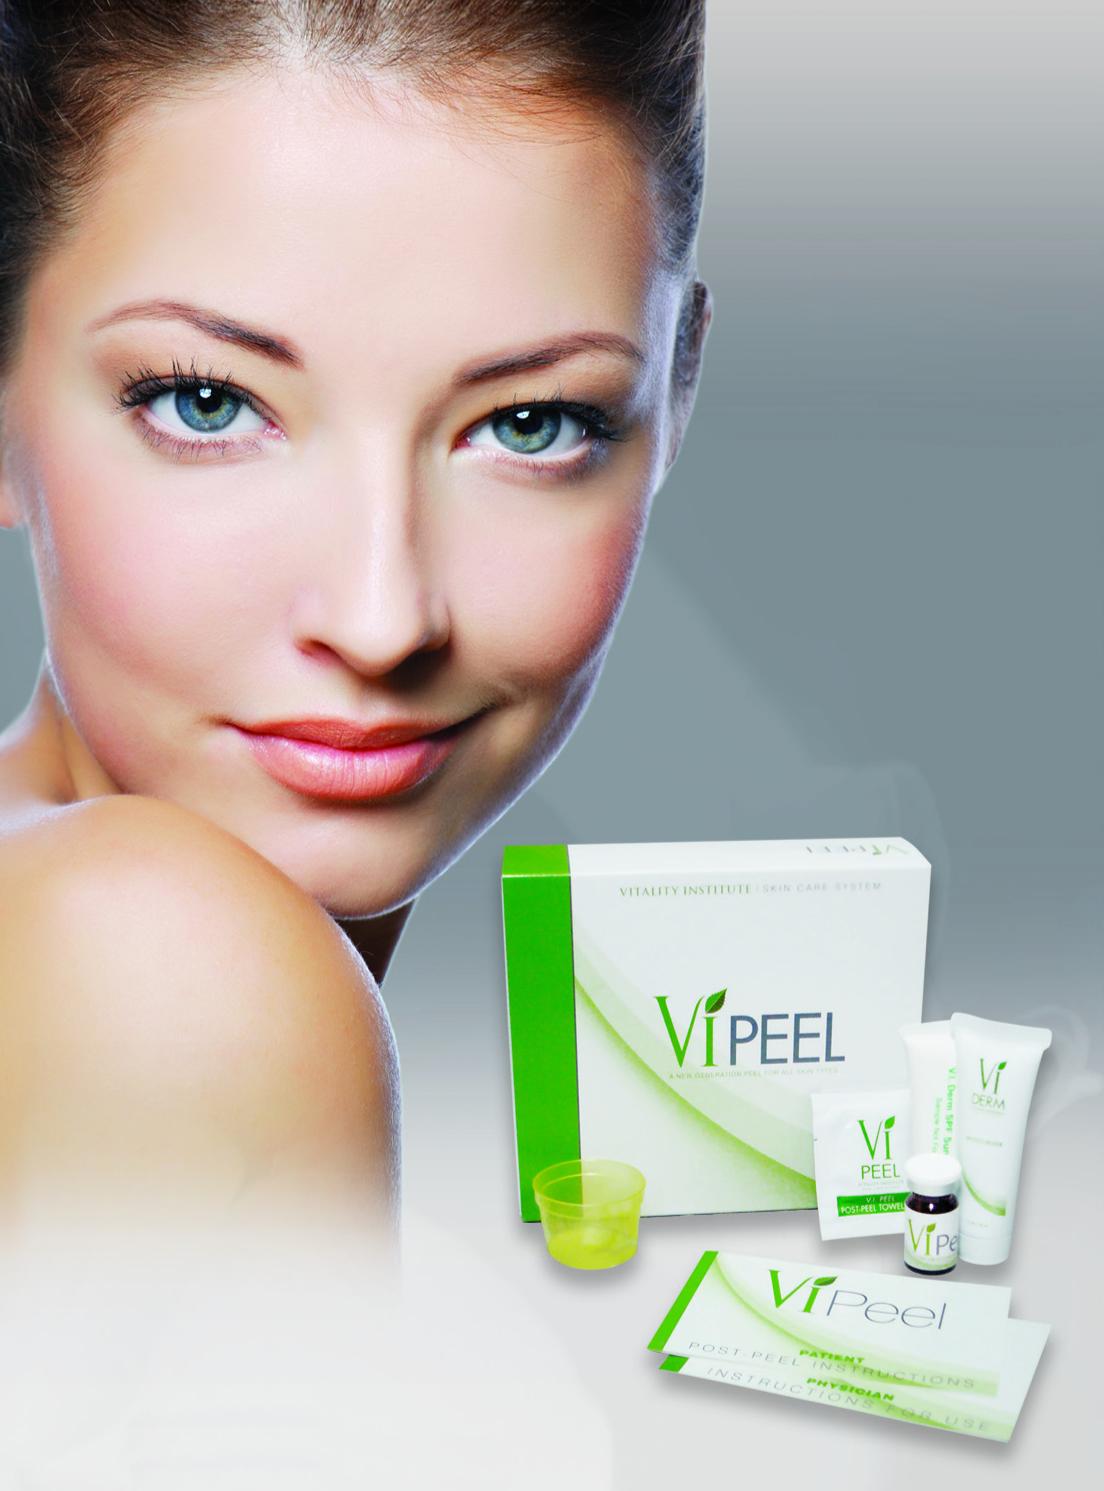 VI Peel